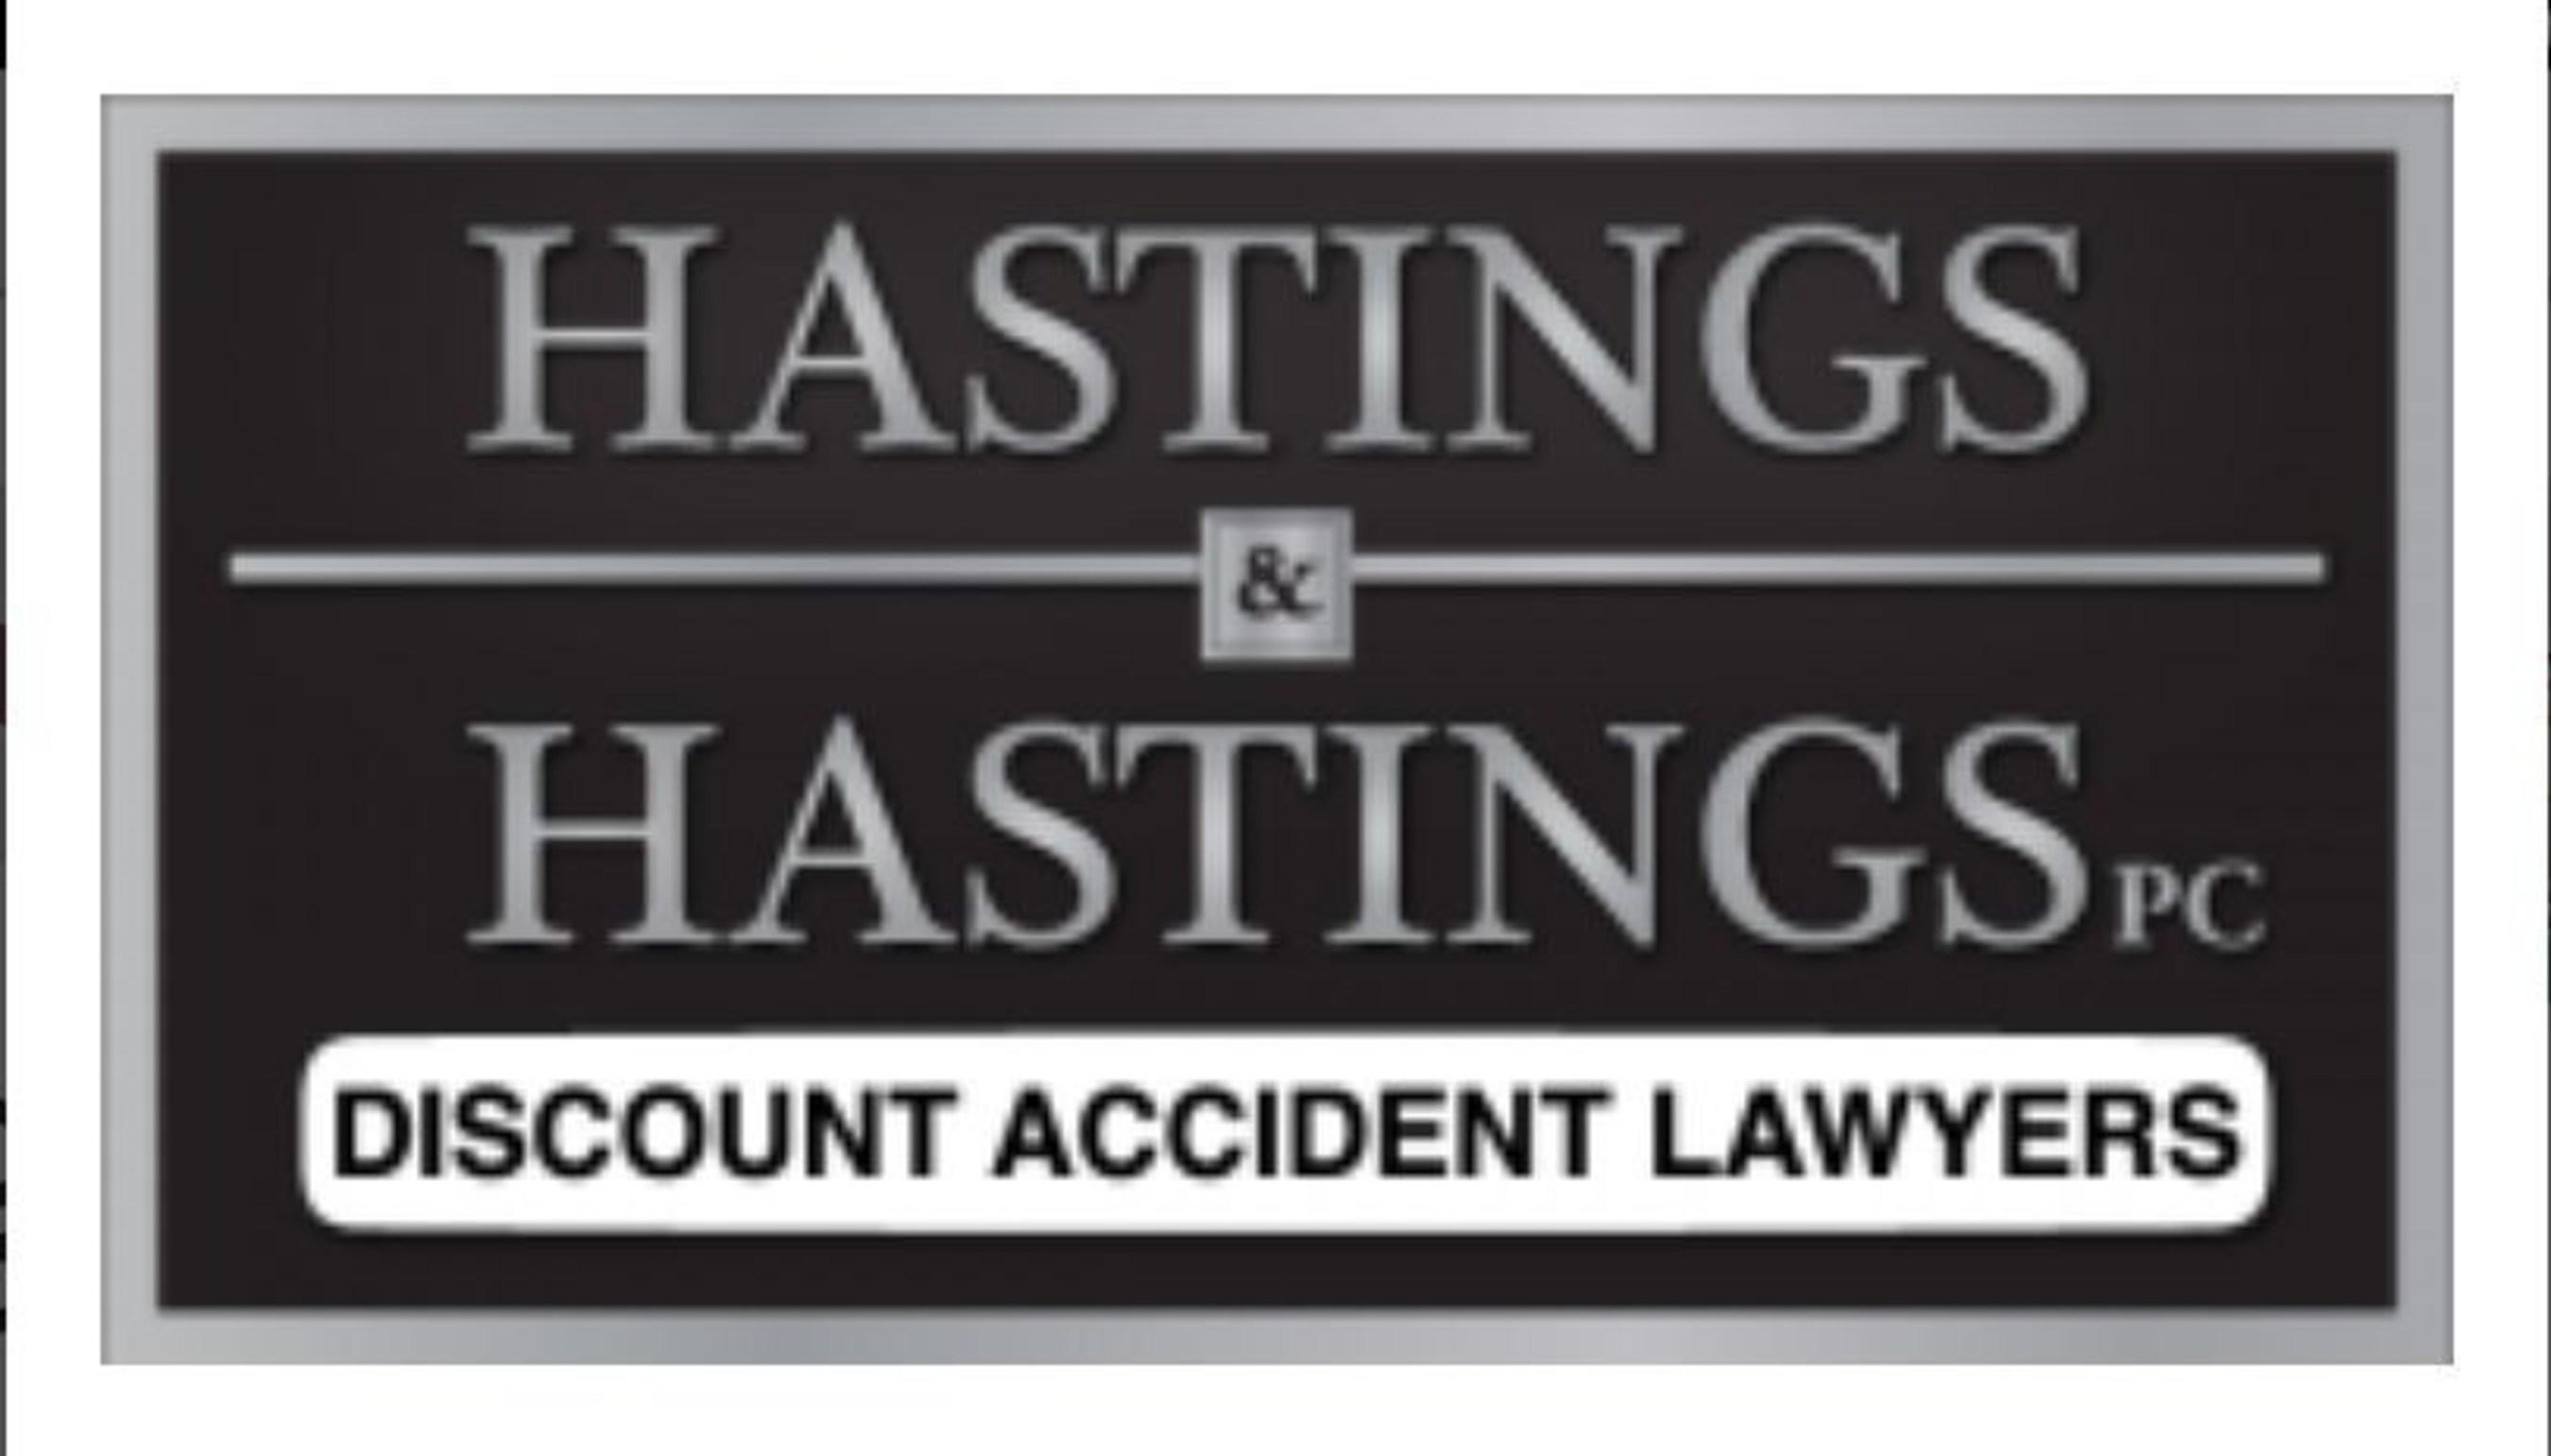 Hastings & Hastings Announces Incredible Client Savings